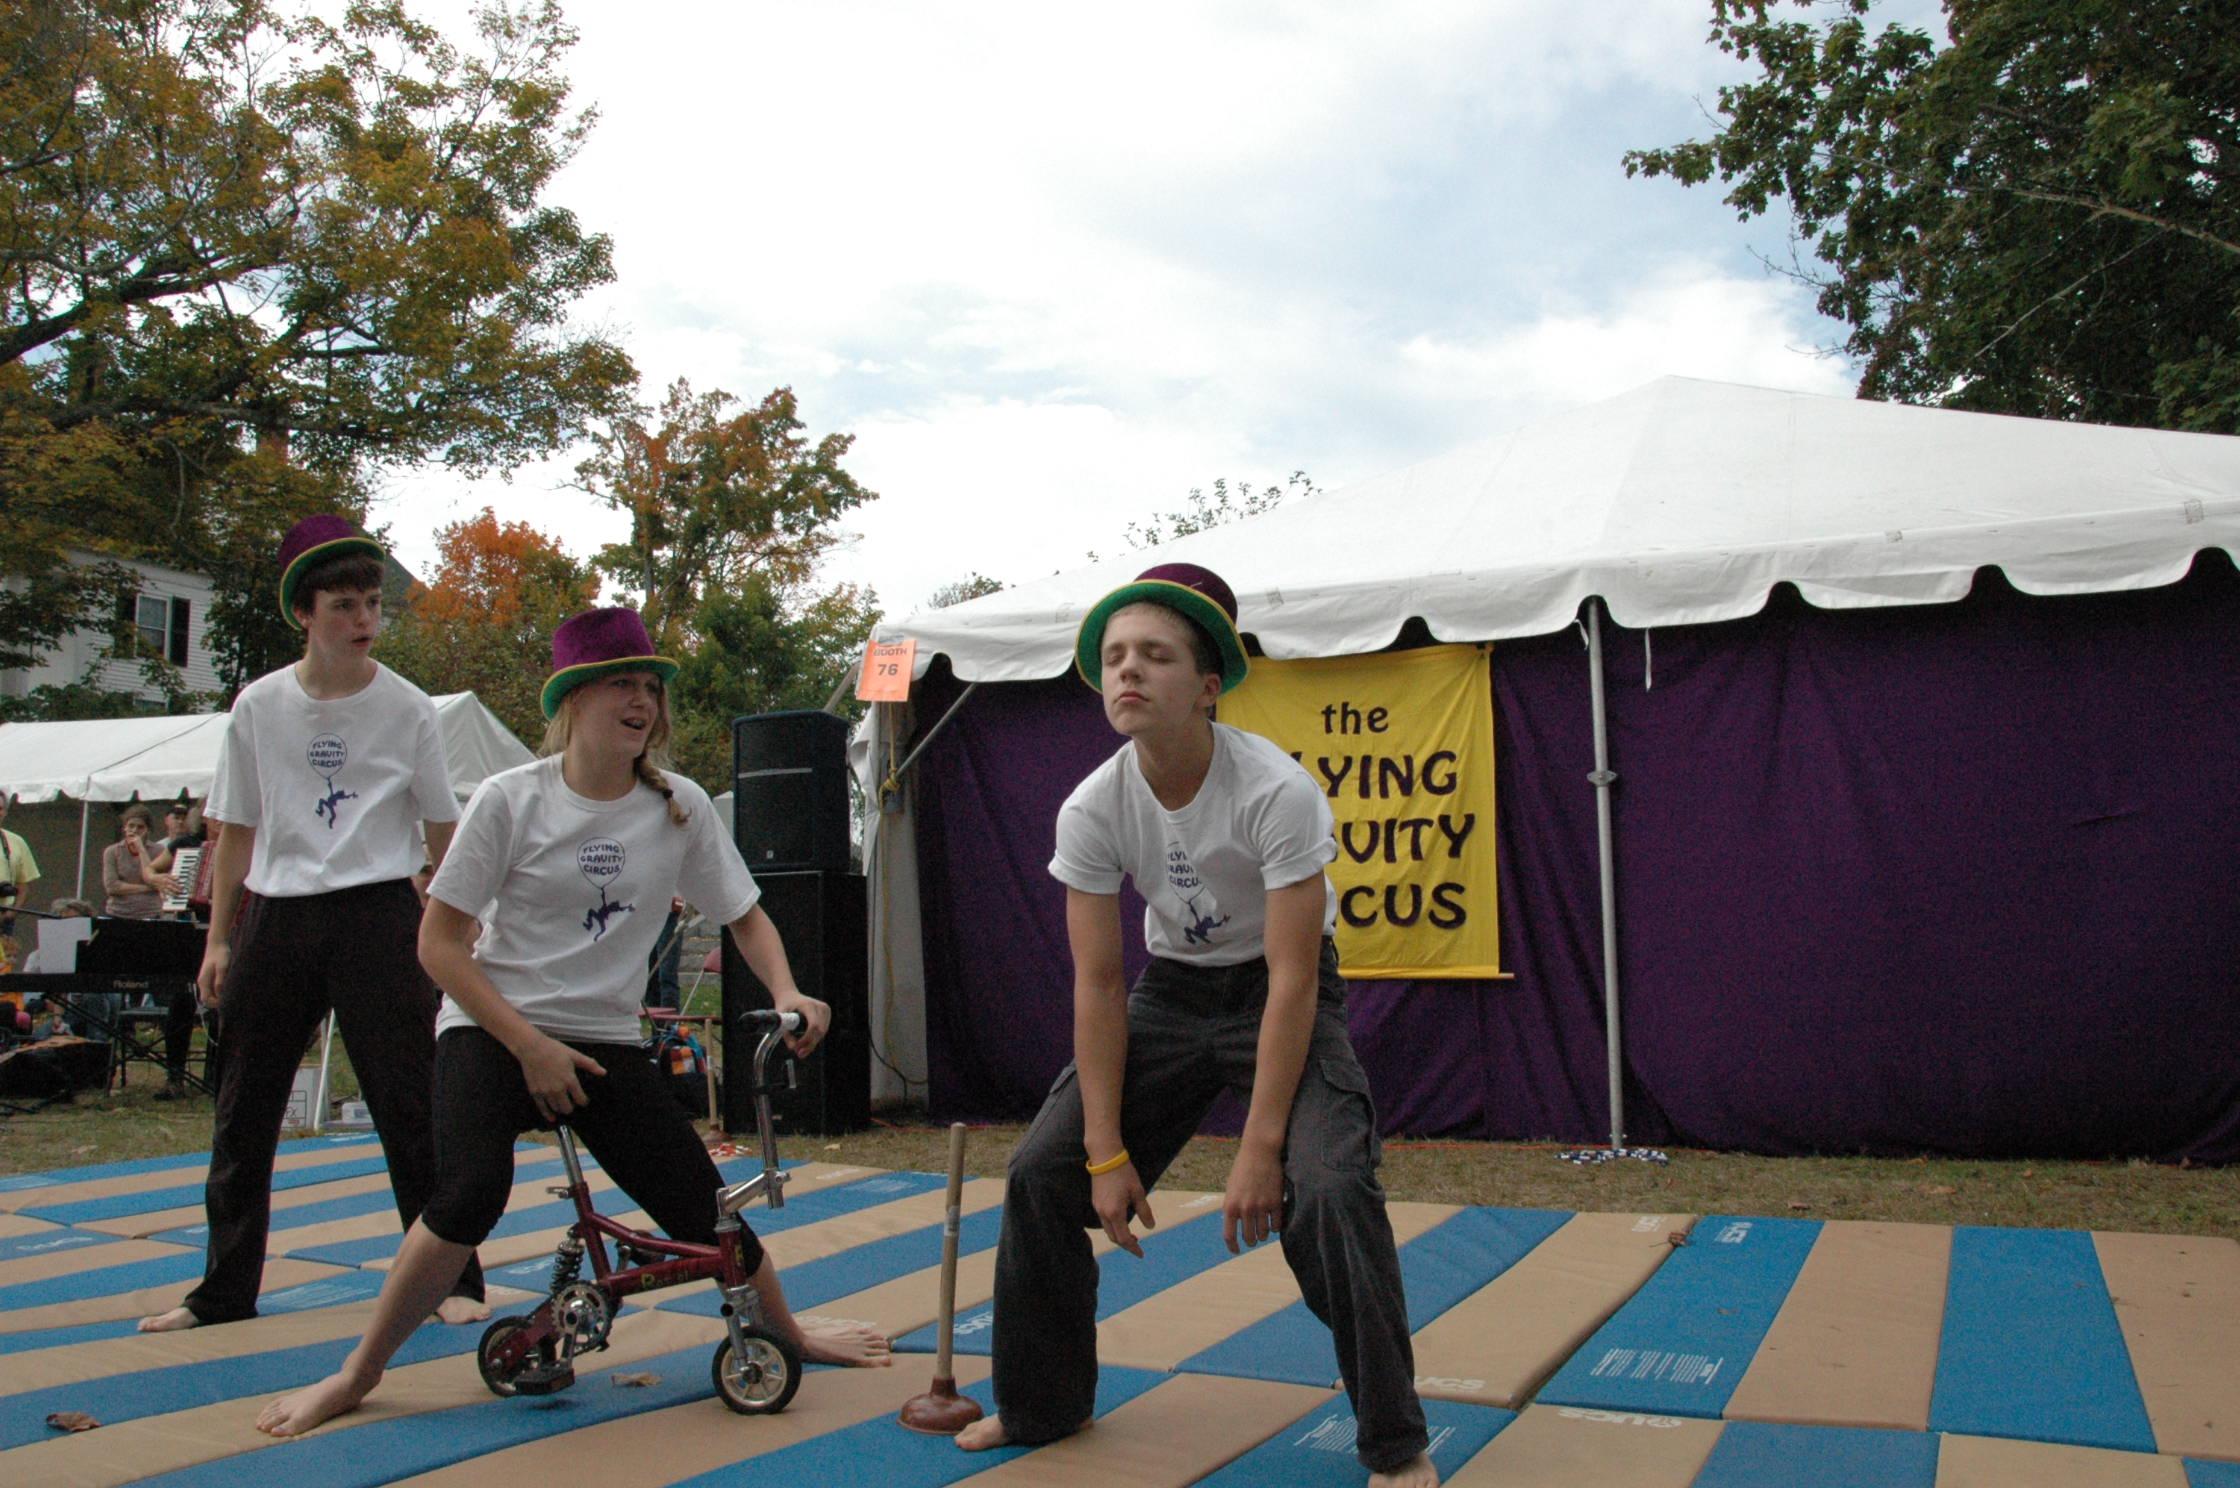 2012-10-06 Flyin Gravity Circus - Pumpkin 101.JPG